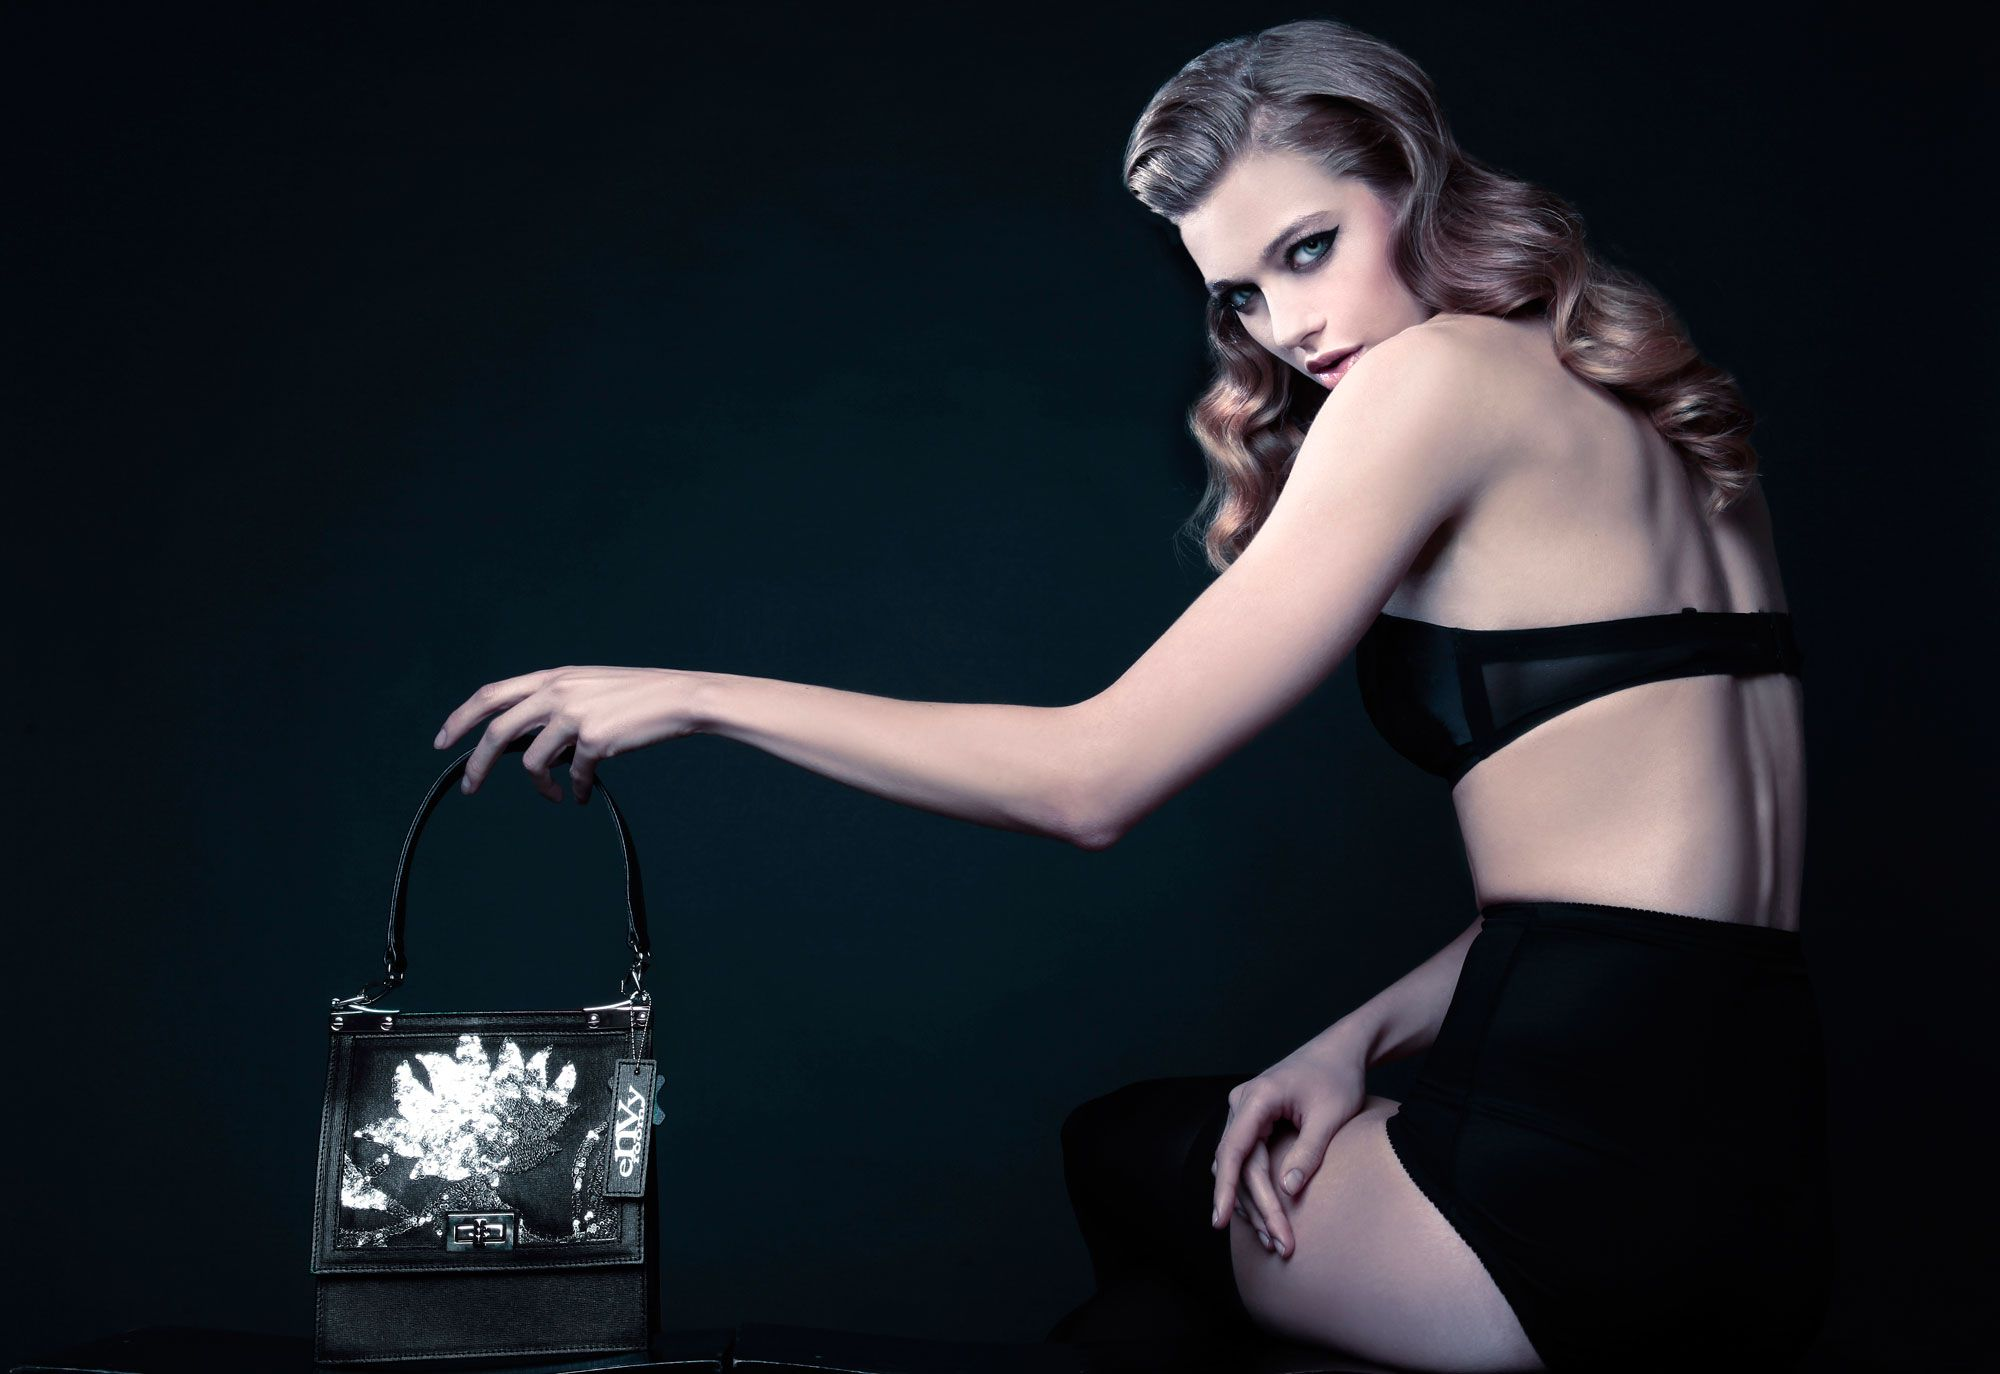 Damske torbe bezvremenske elegancije novitet su kuće eNVy room